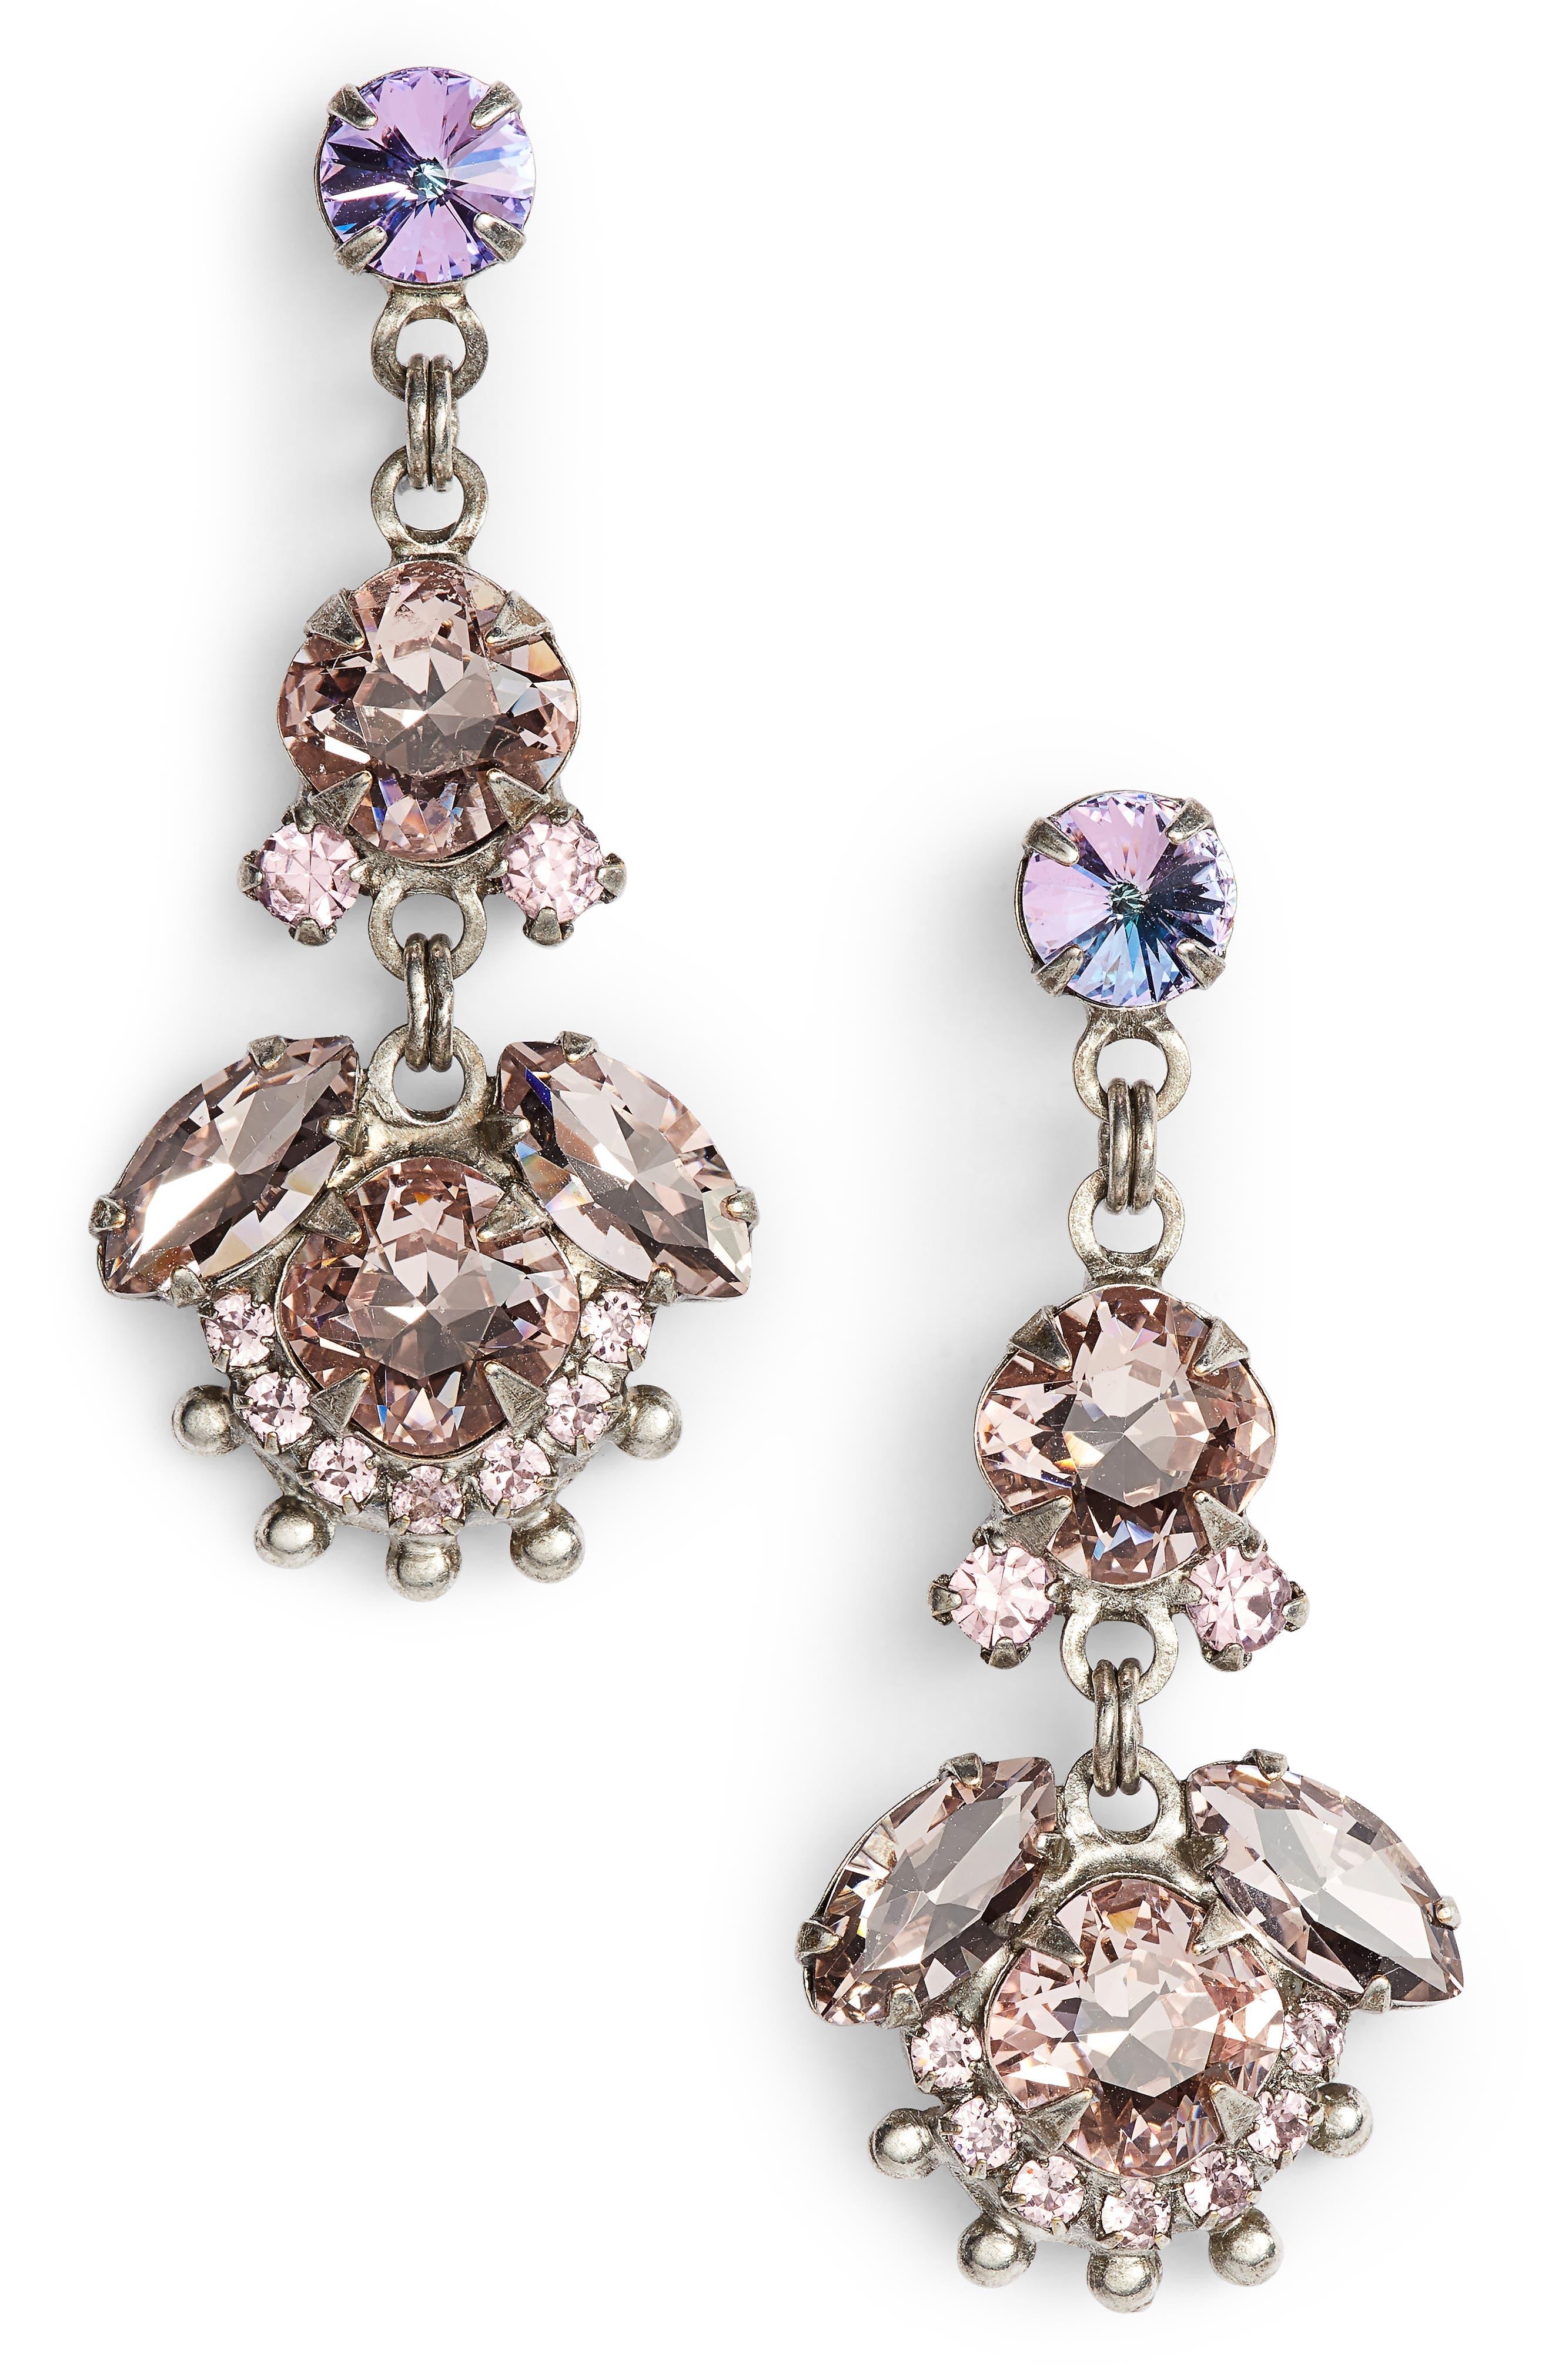 California Poppy Crystal Drop Earrings,                             Main thumbnail 1, color,                             PINK